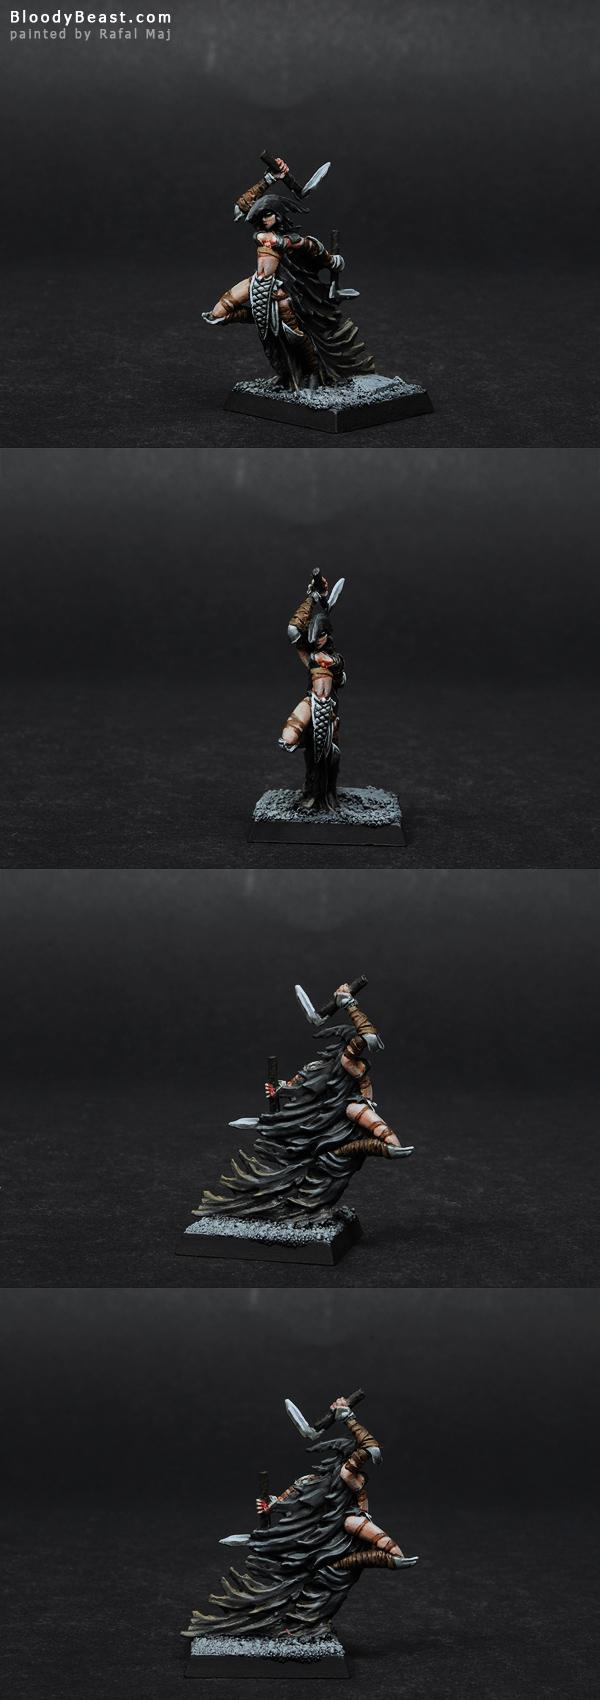 Darkreach Darkshade Raider painted by Rafal Maj (BloodyBeast.com)